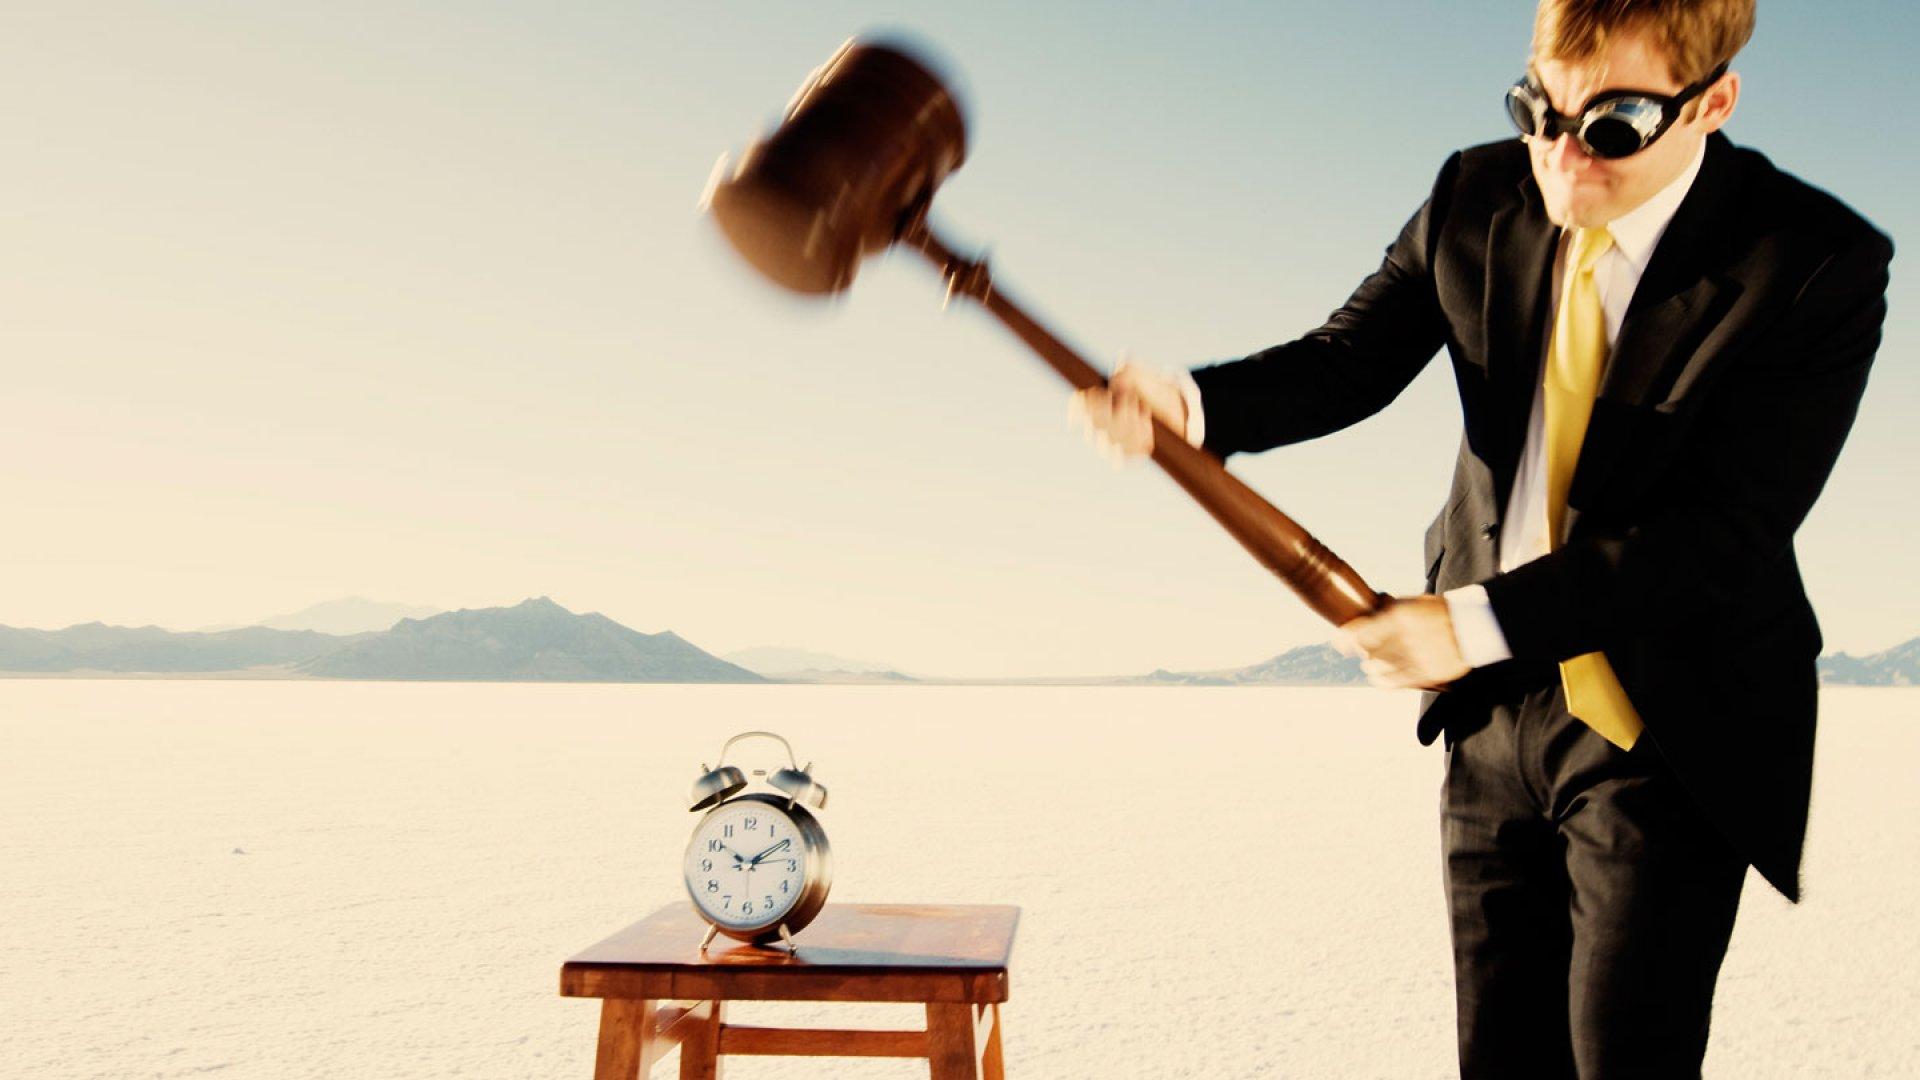 Killer Motivating Tactic: Break the Time Clock